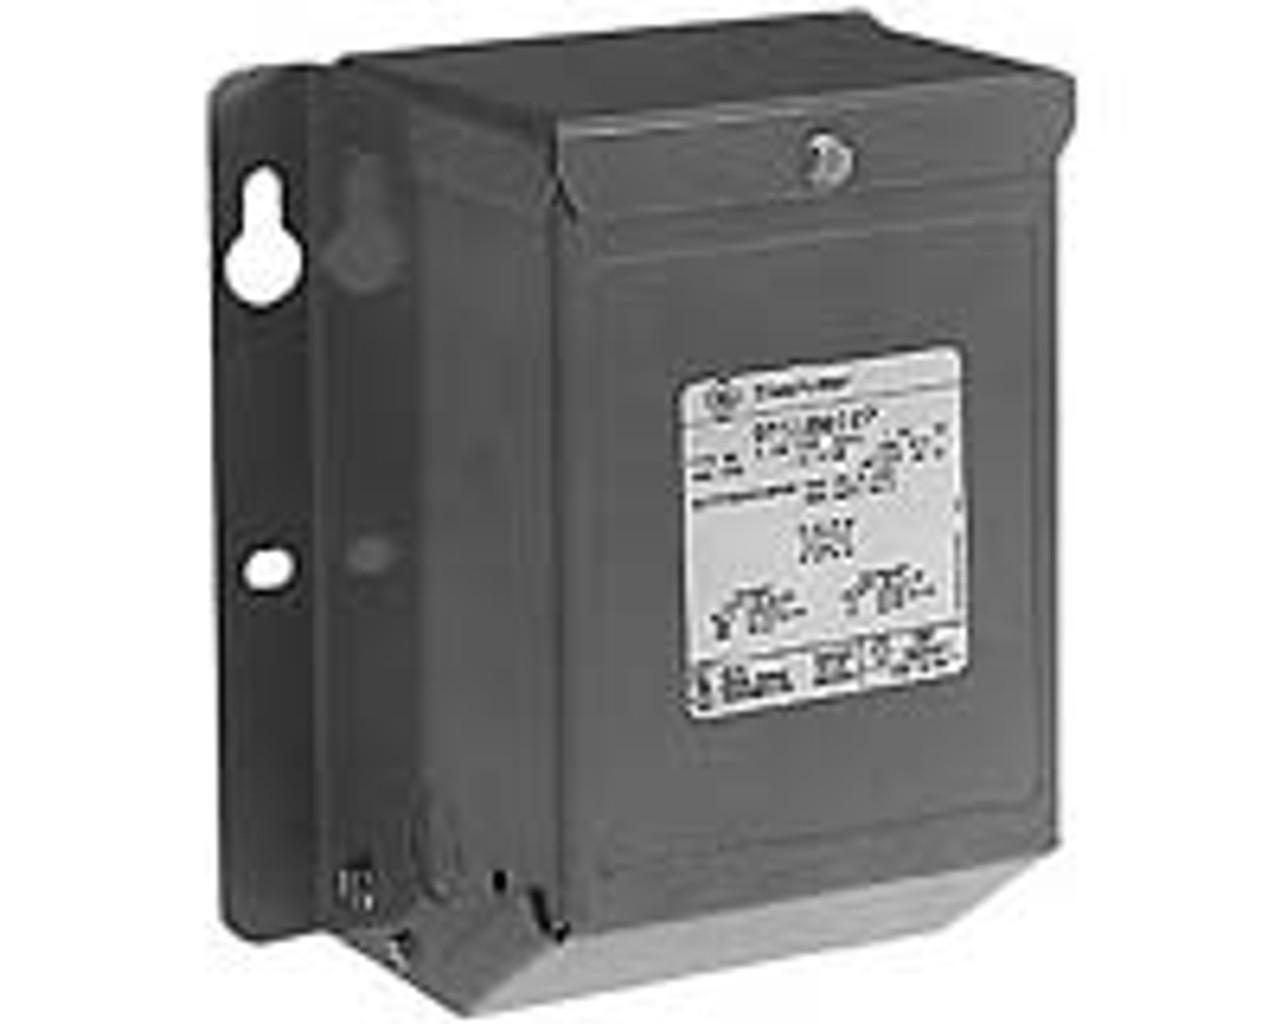 GE 9T51B0888 - 0.5 KVA 600 TO 120/240 VOLTS 1PH TRANSFORMER - New